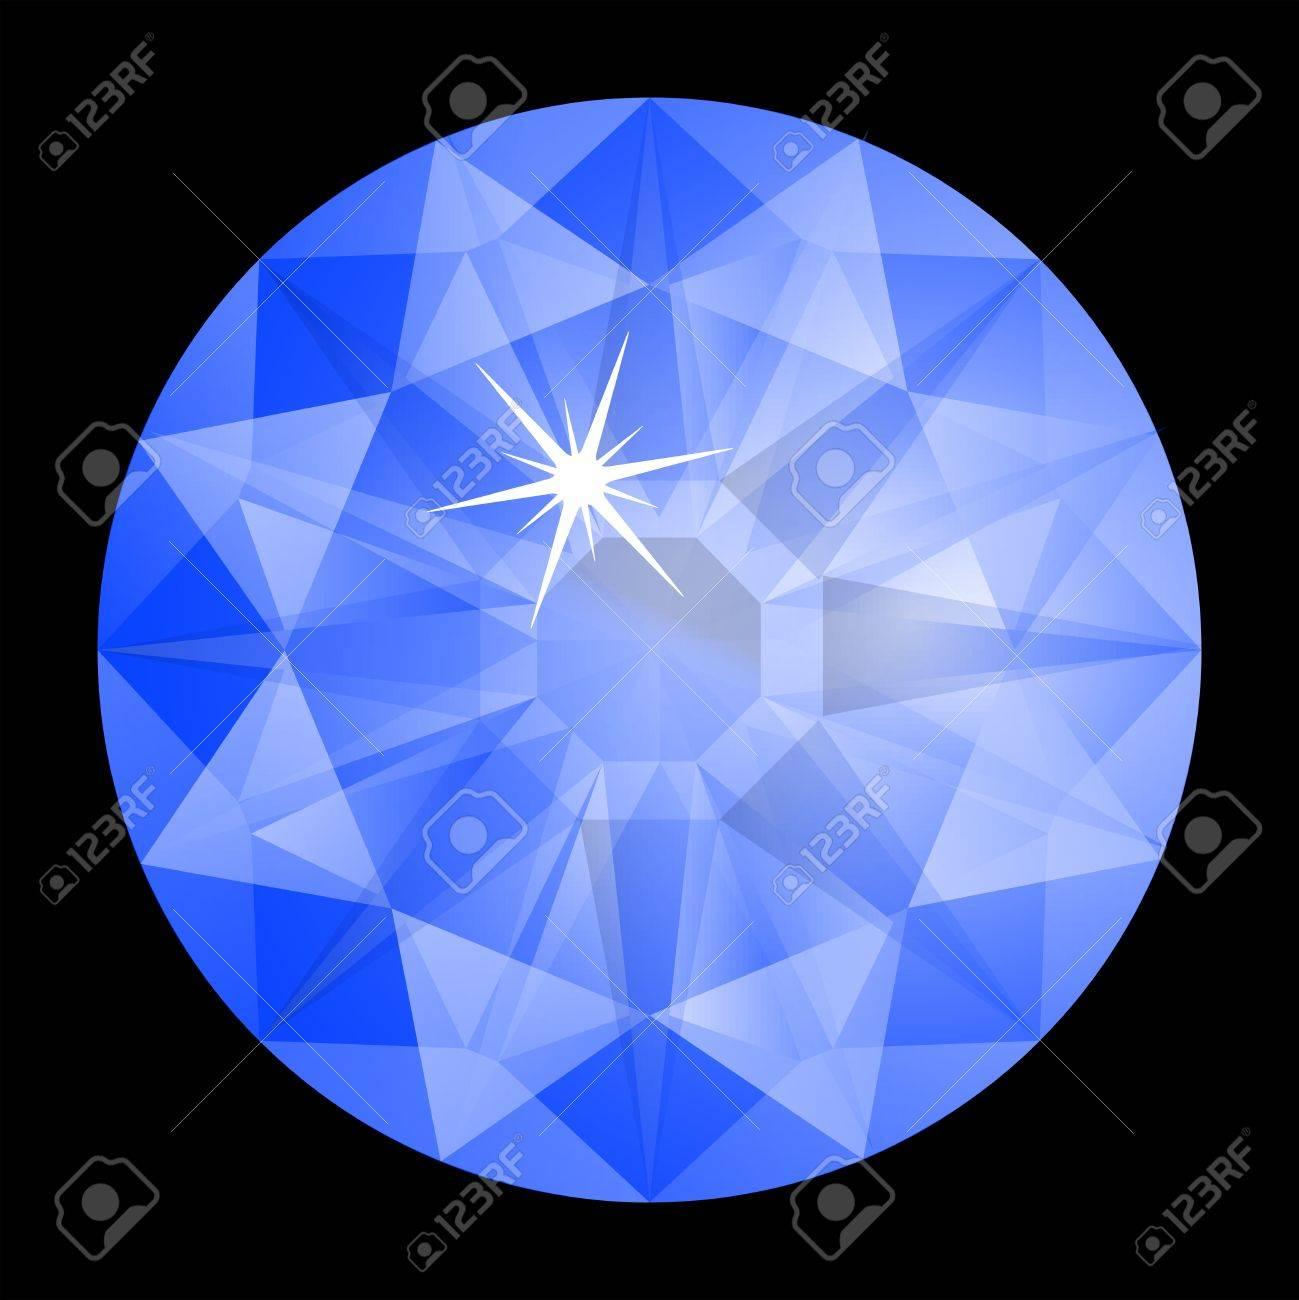 blue diamond against black background, abstract art illustration Stock Vector - 7068451